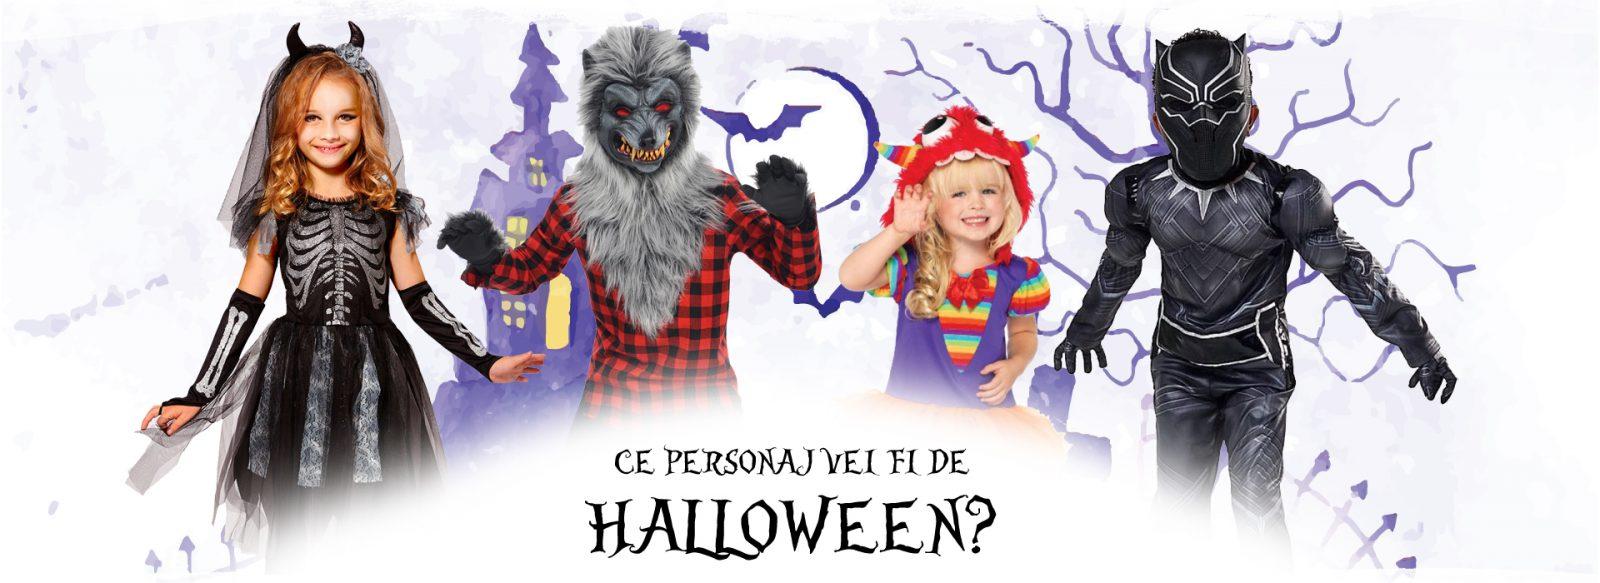 CarnavalFiesta Costume si Accesorii